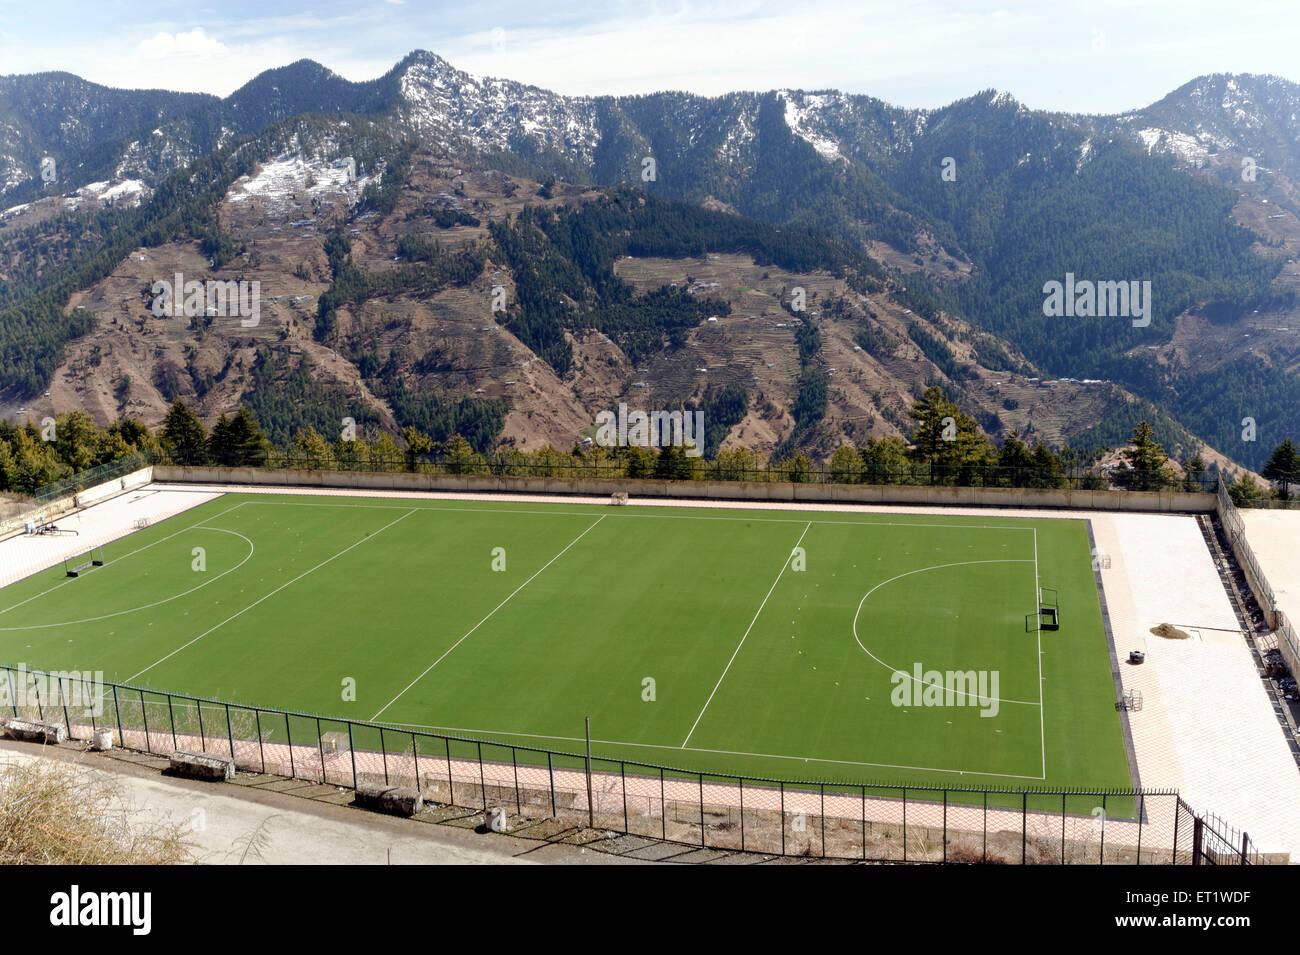 High Altitude Artificial Hockey Rajiv Gandhi Ground at Himachal Pradesh India  Asia - Stock Image